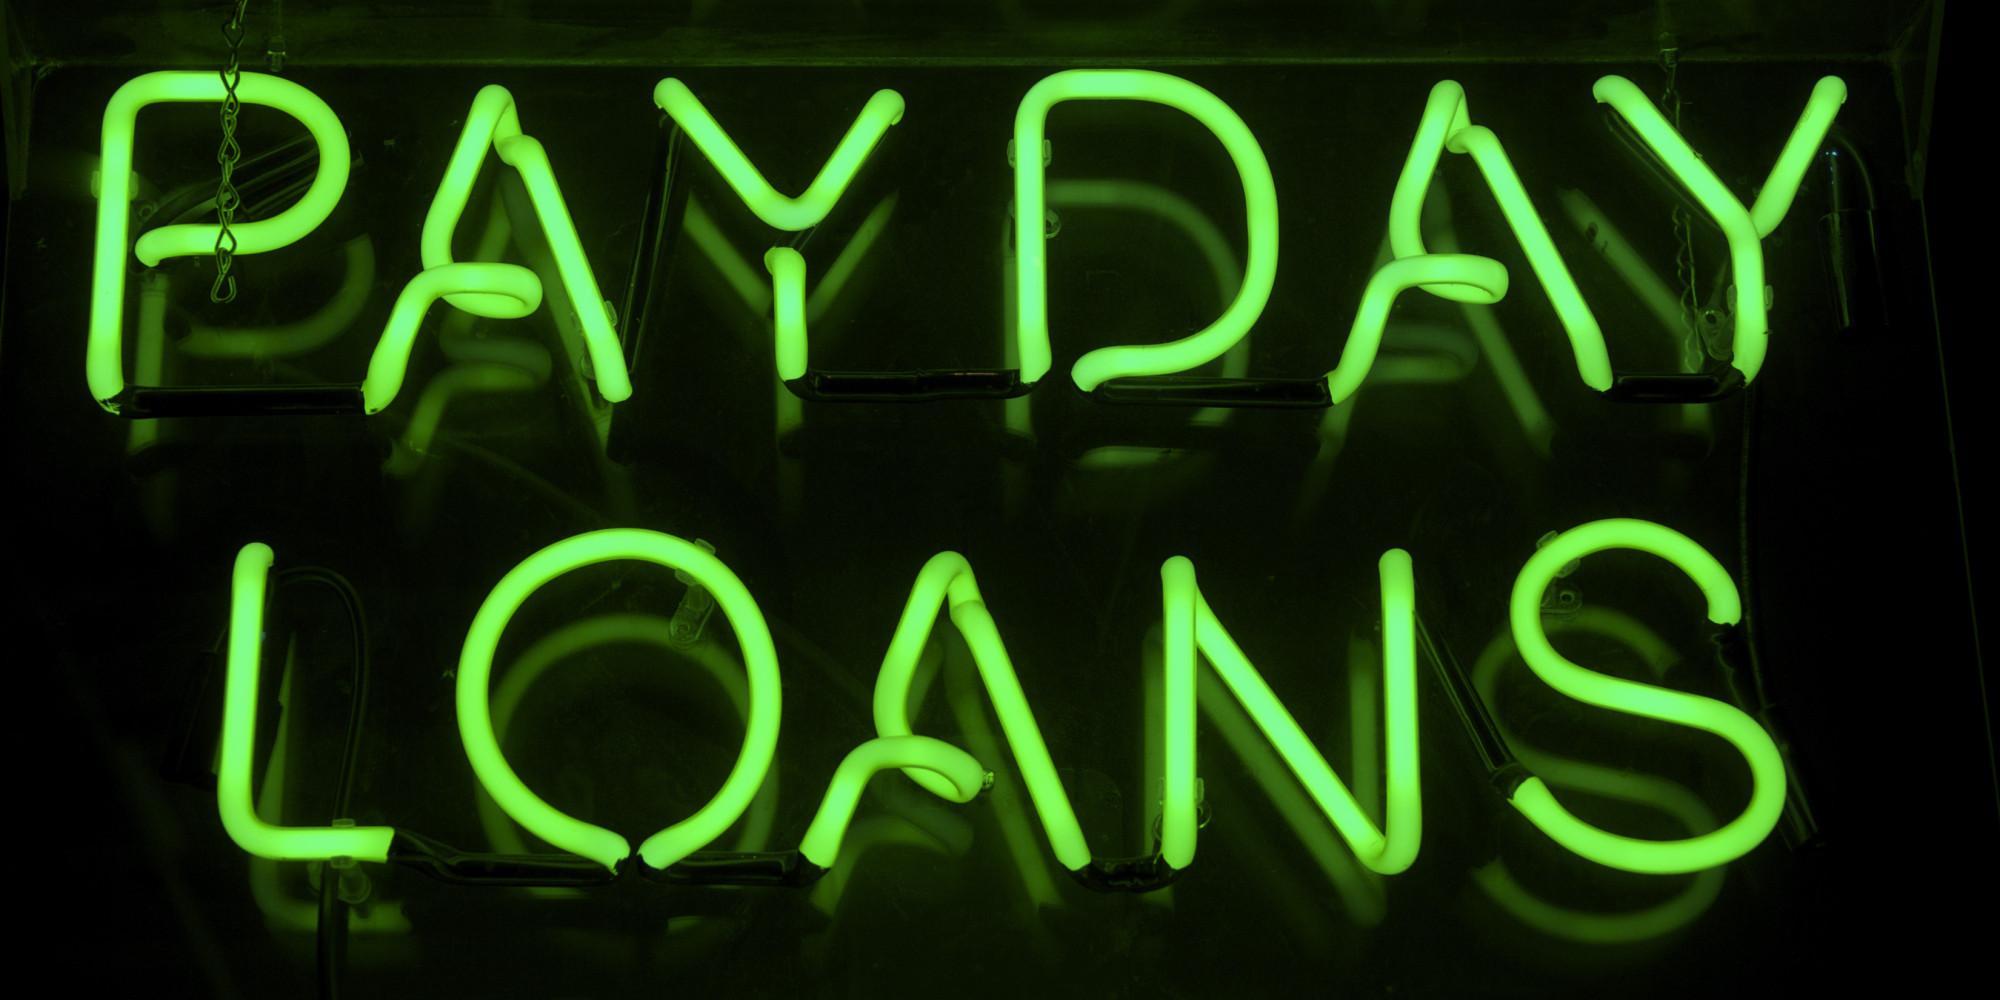 Cash advance north providence ri image 9